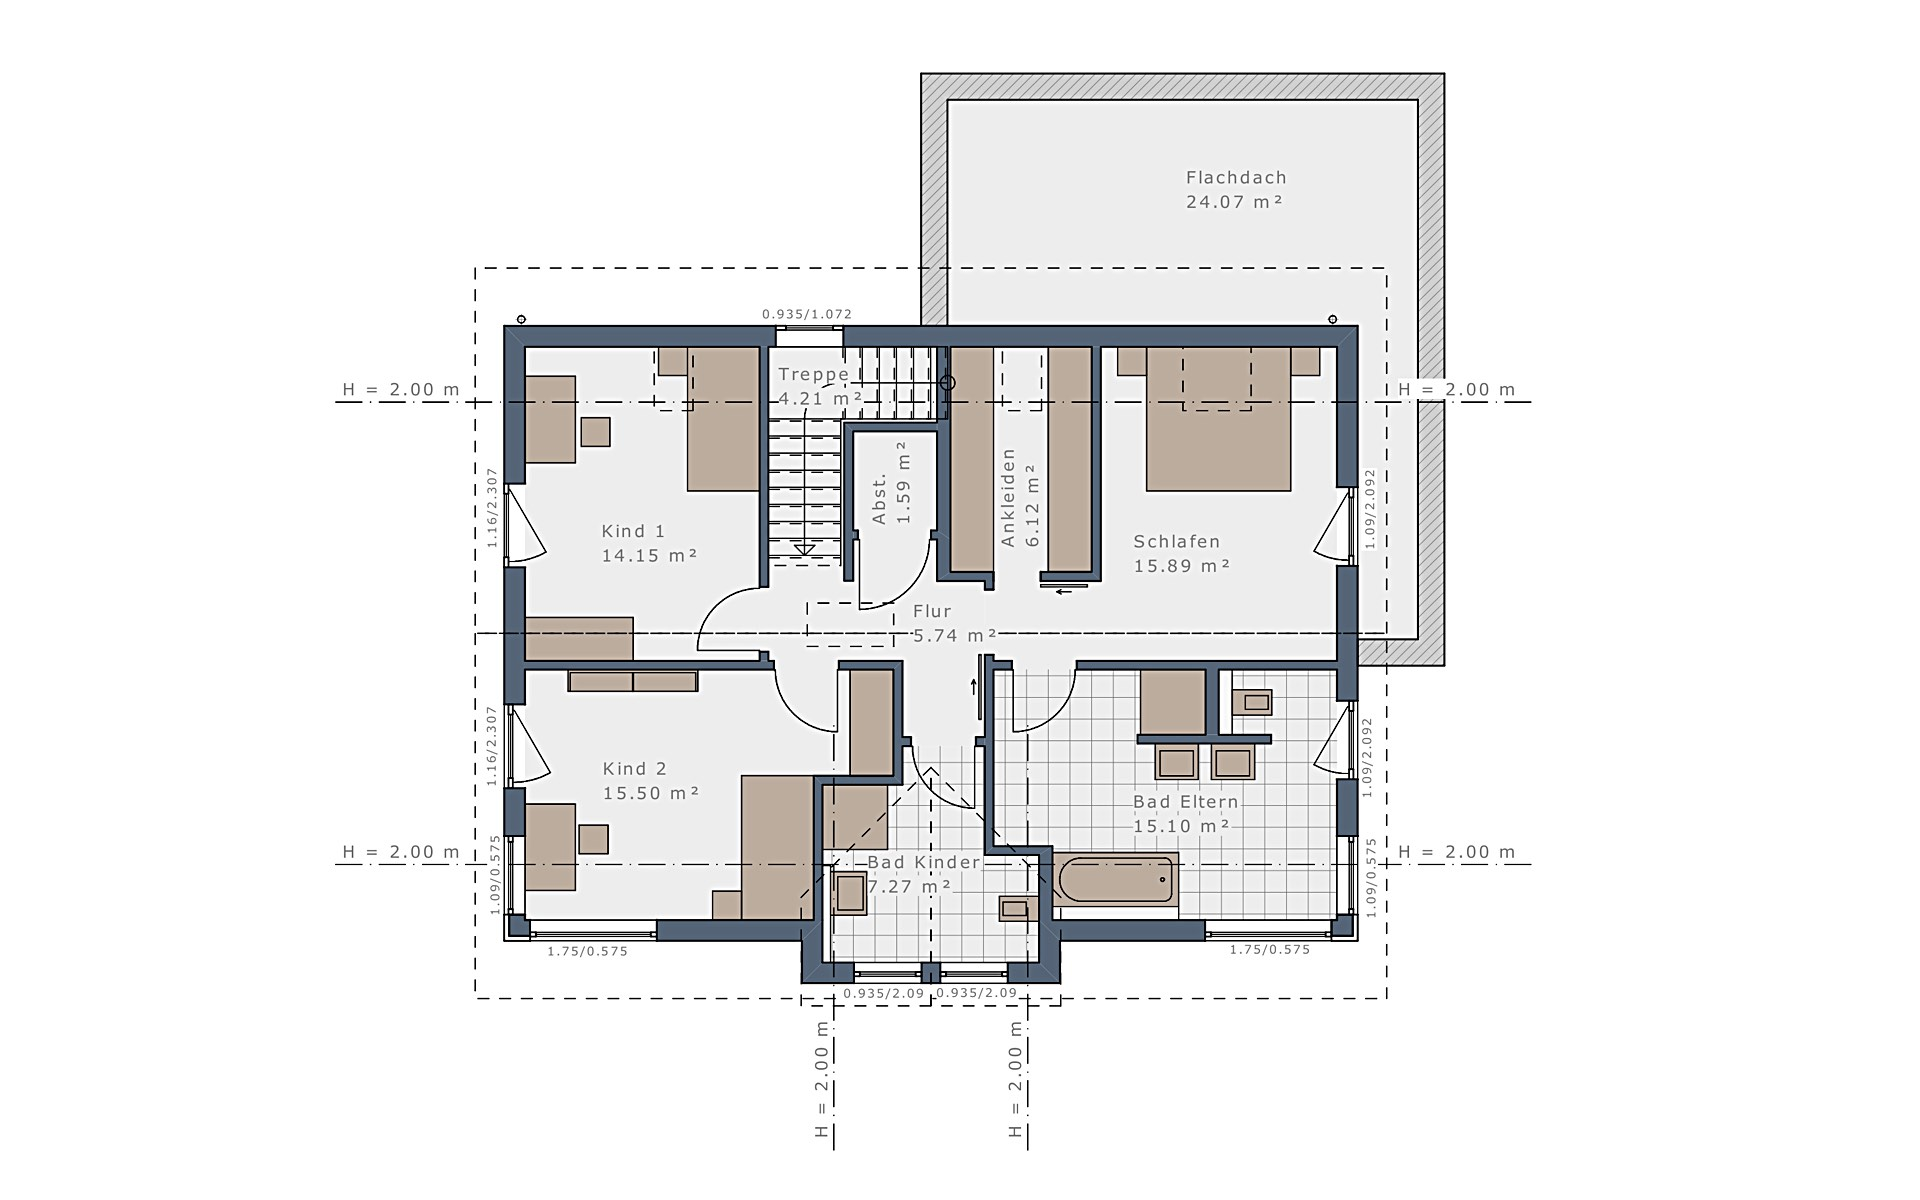 Dachgeschoss Selection-E-169 E5 von Schwabenhaus GmbH & Co. KG